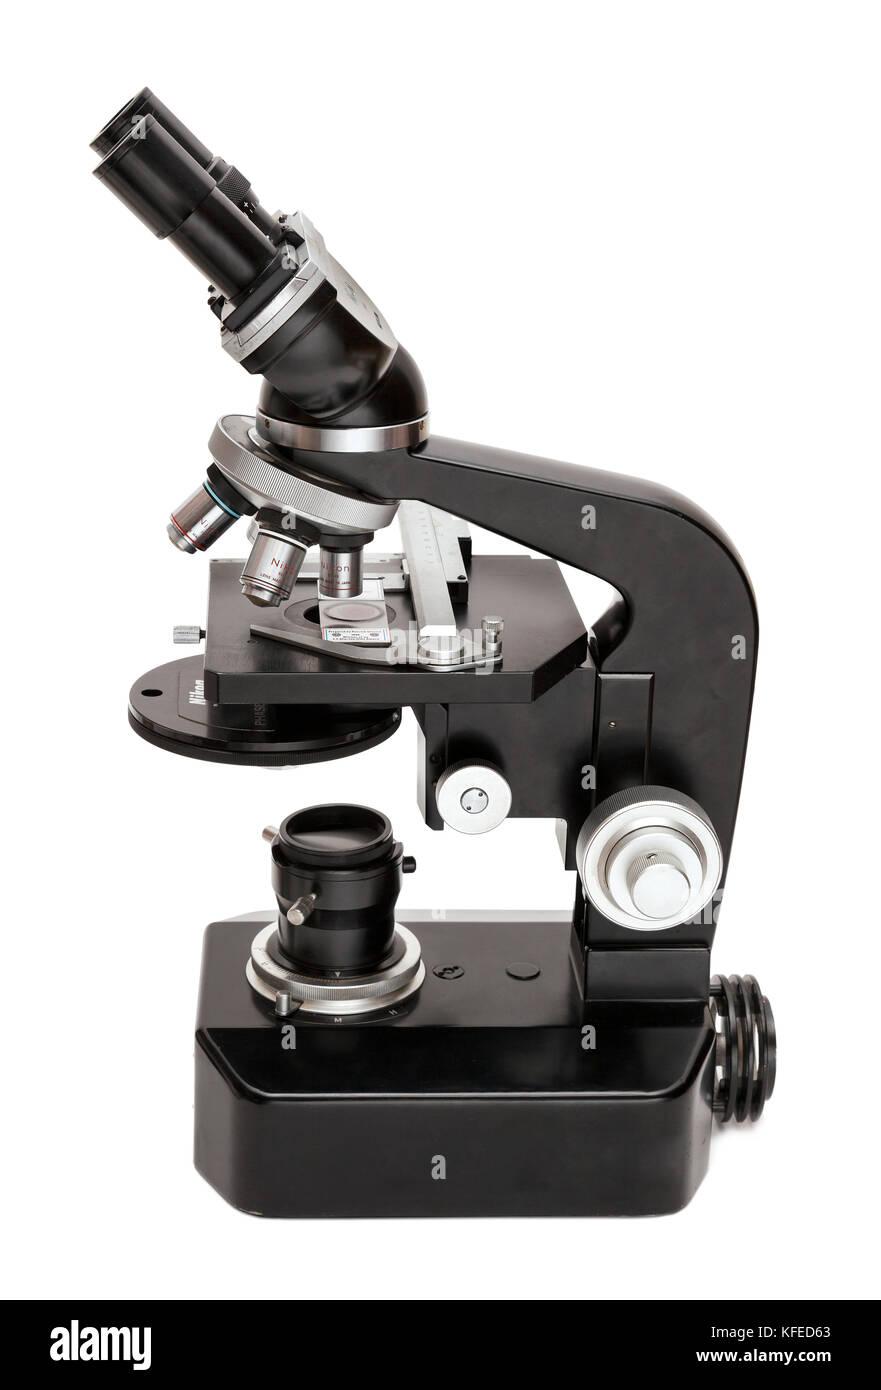 Vintage Nikon S compound microscope, phase contrast